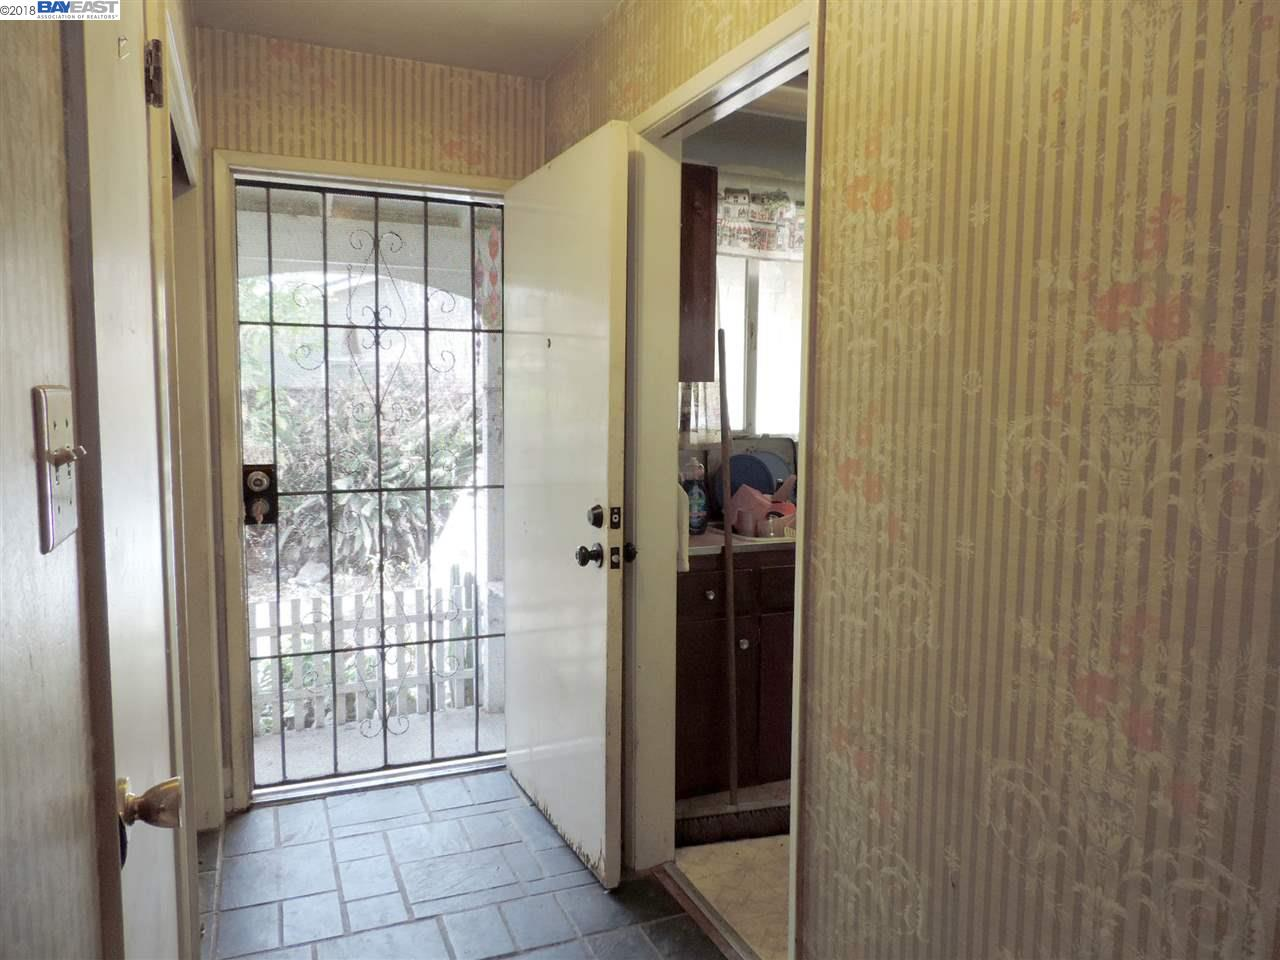 Additional photo for property listing at 24650 Townsend Avenue 24650 Townsend Avenue Hayward, California 94544 Estados Unidos